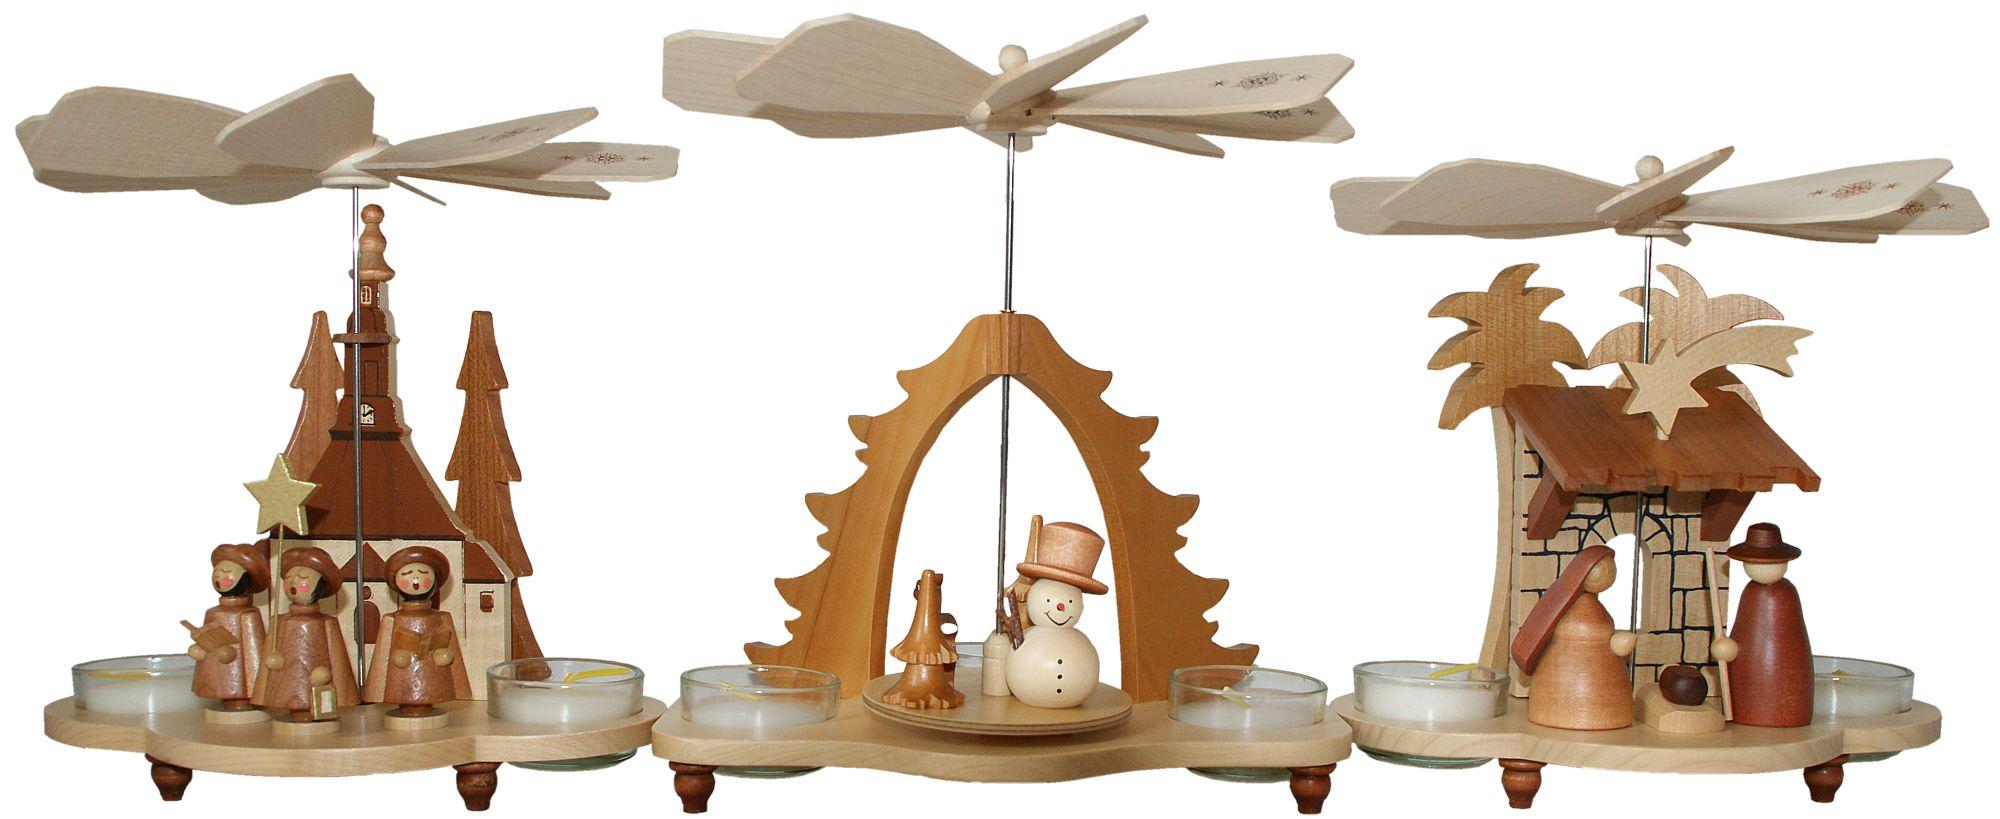 Teelichtpyramiden